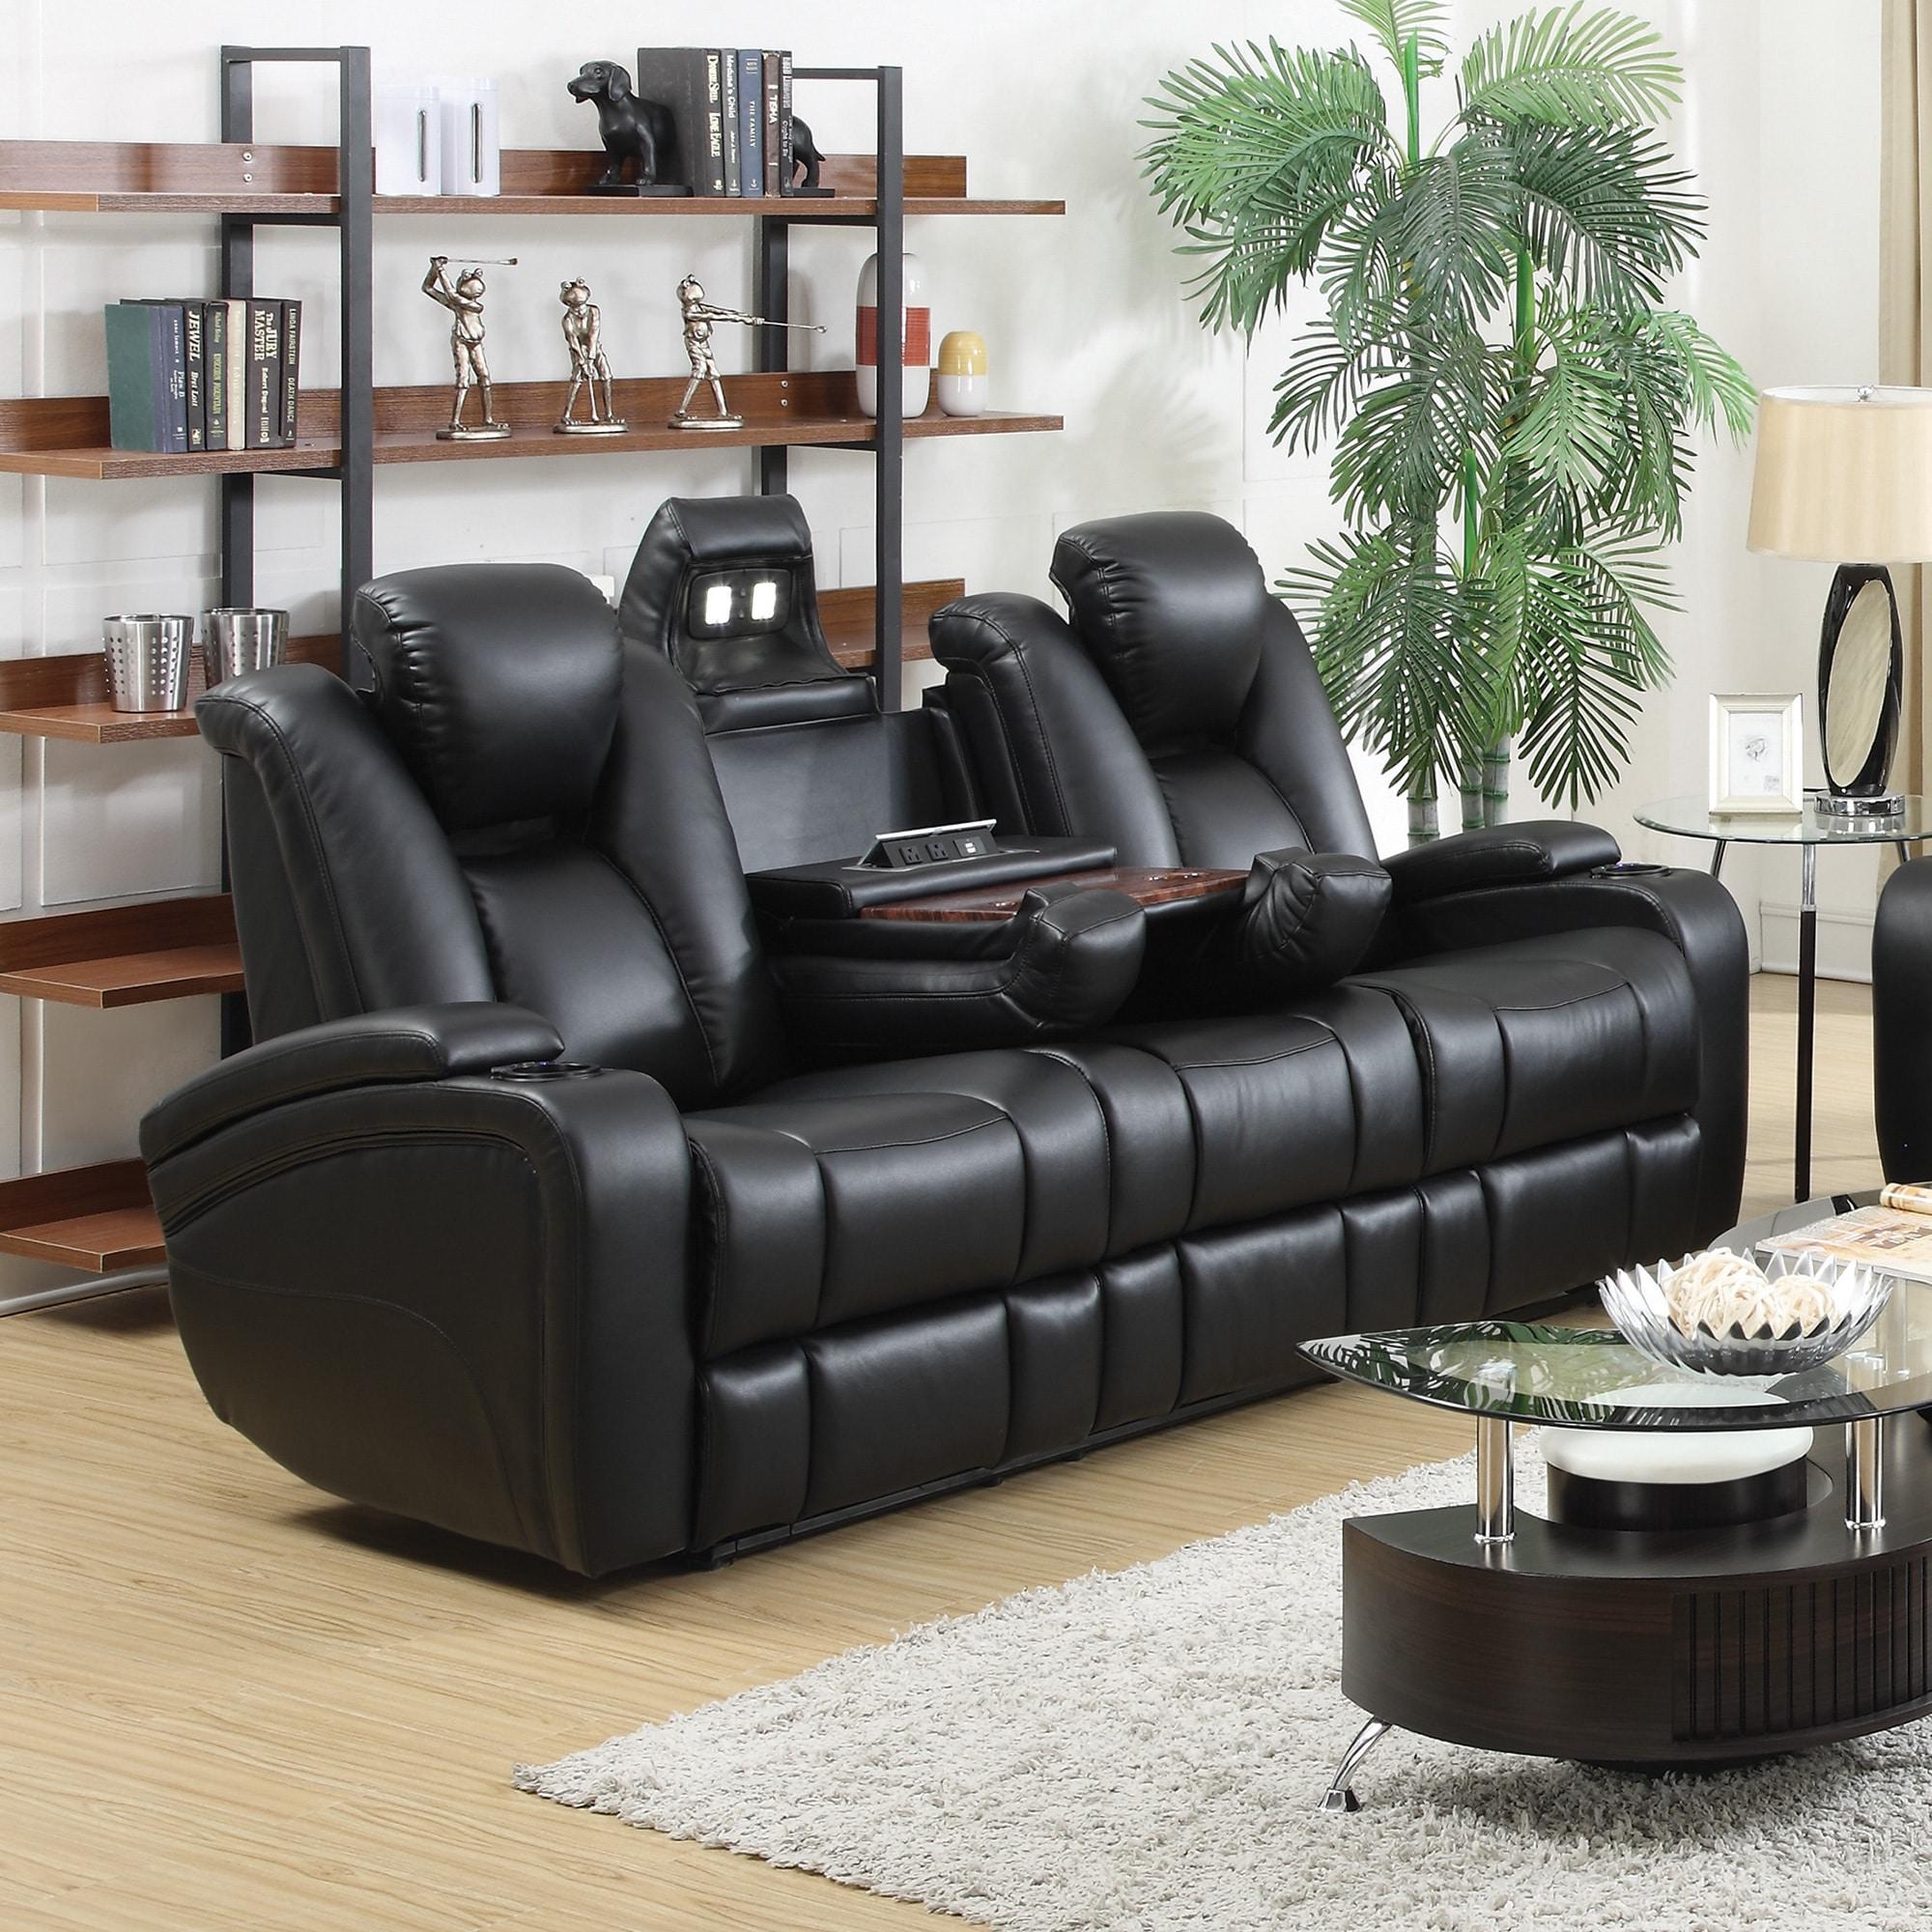 Recliner Motion Sofa